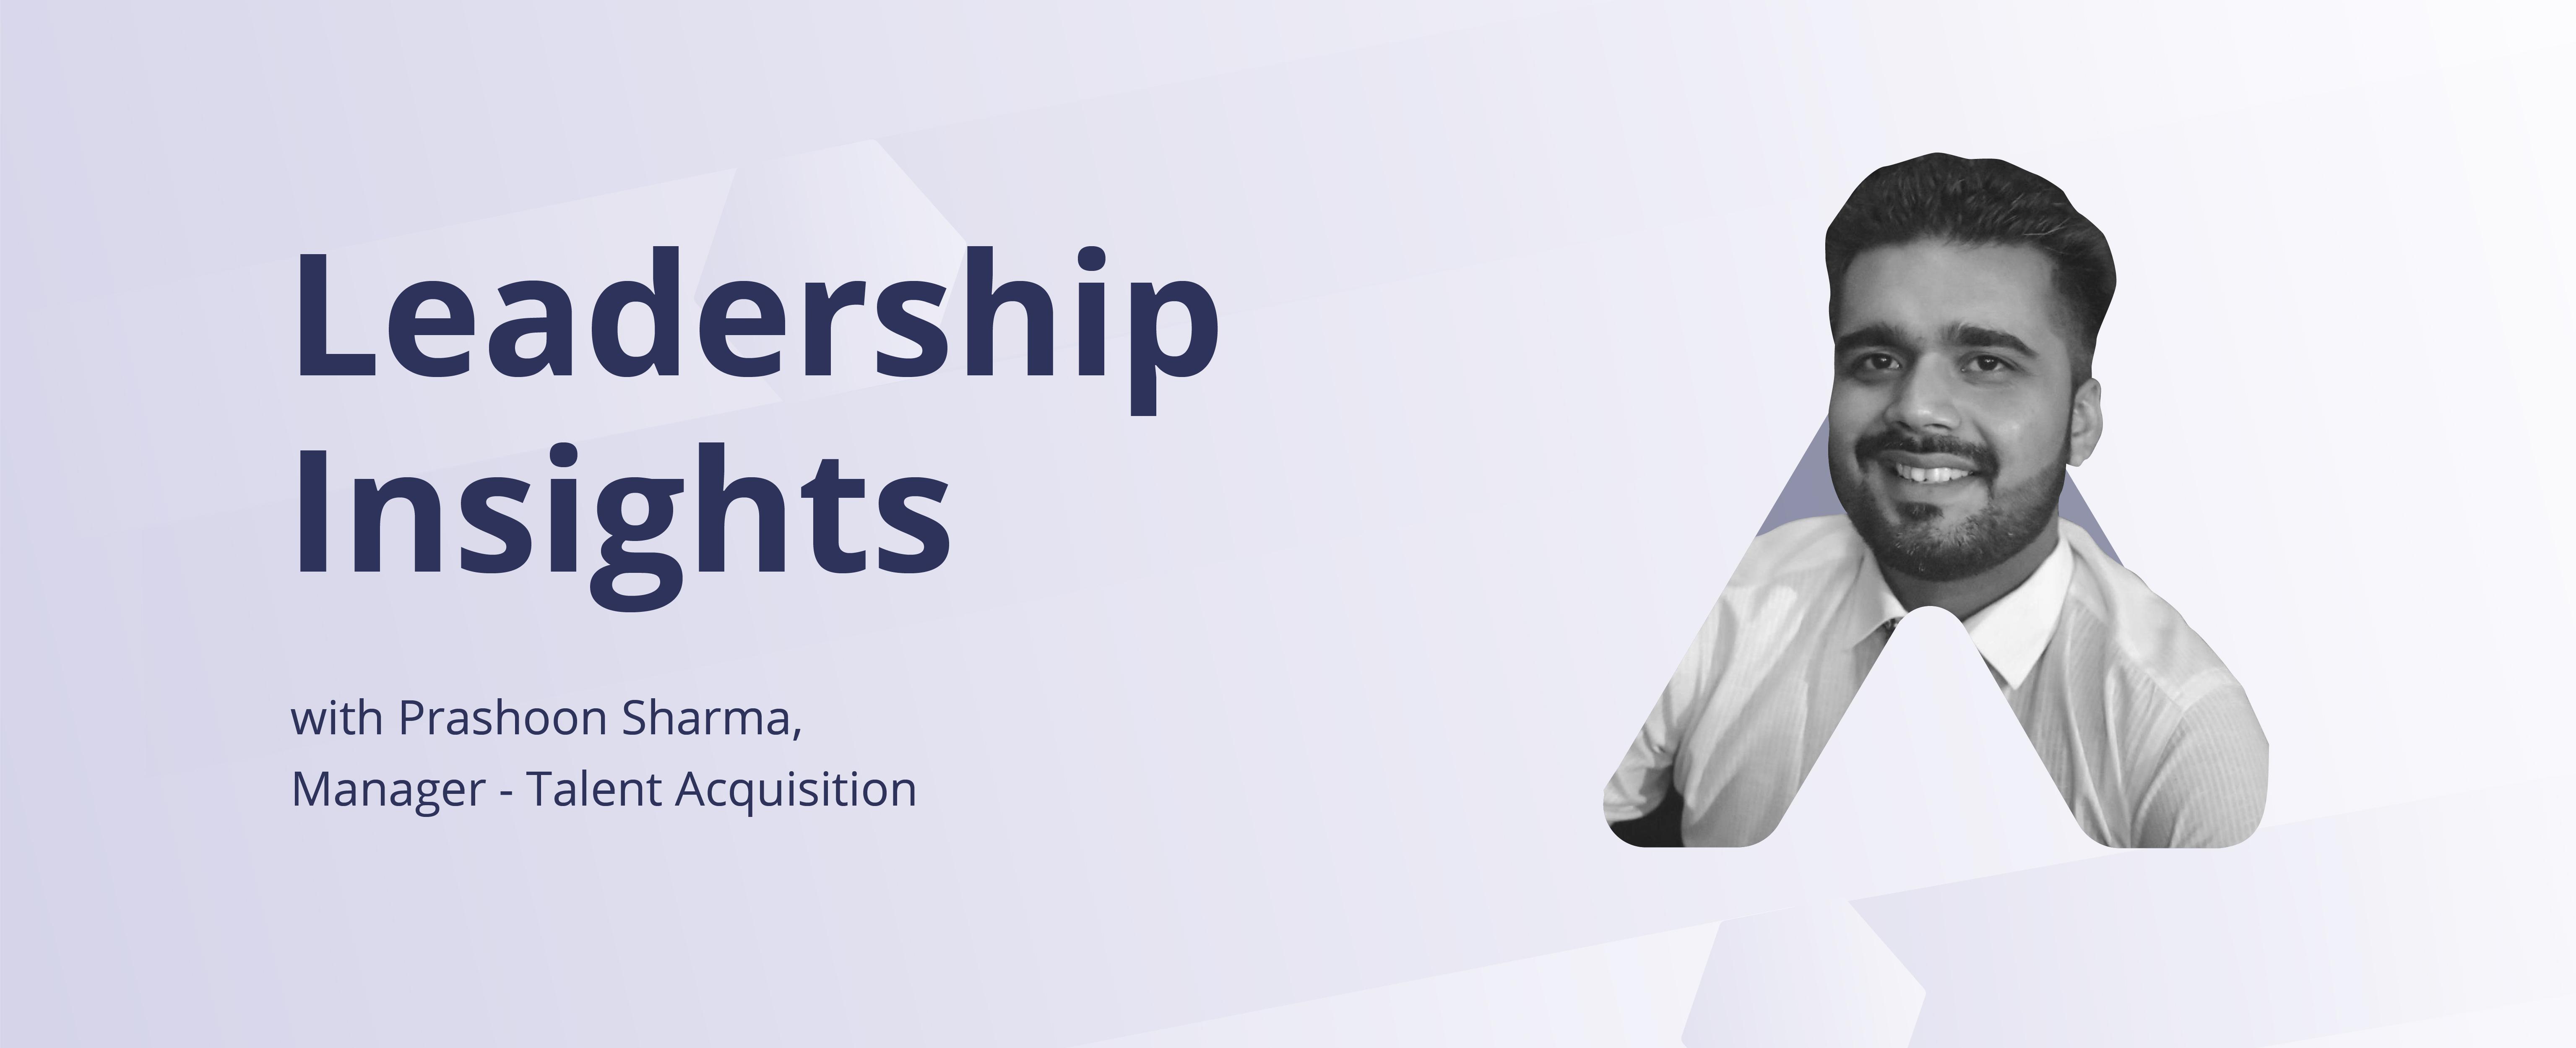 Leadership Insights with prashoon Sharma